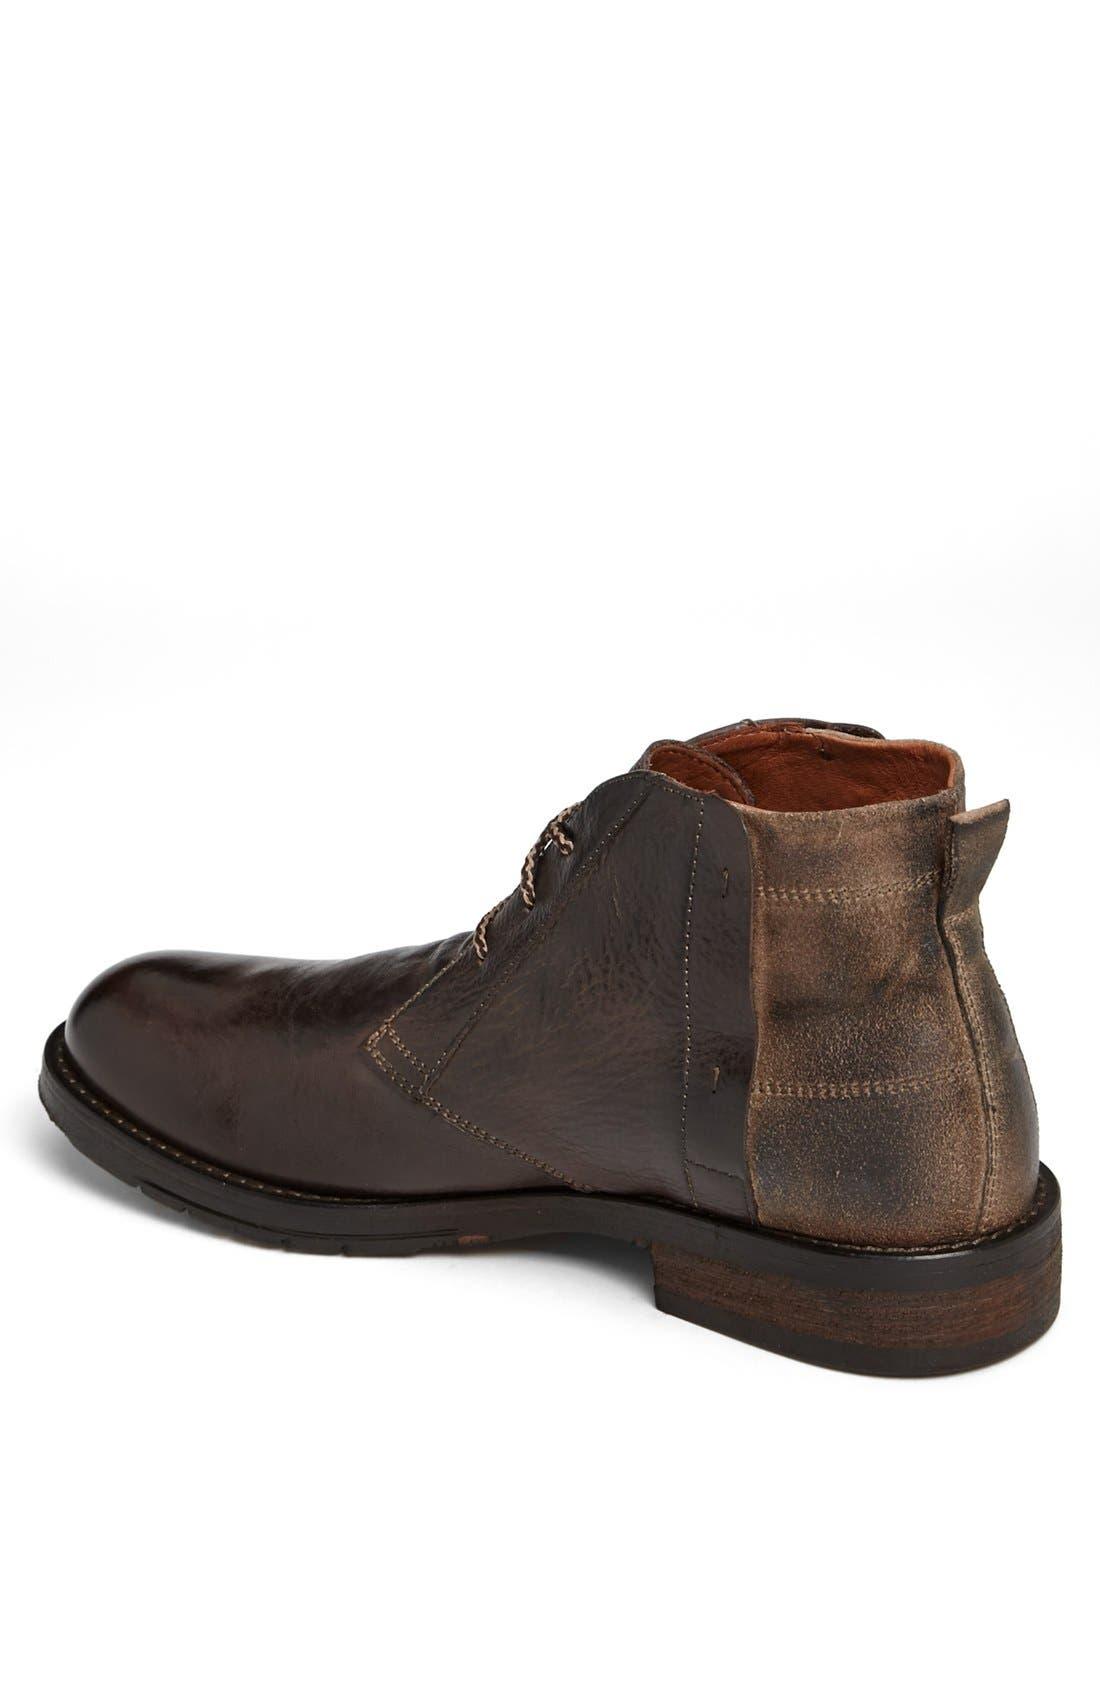 Alternate Image 2  - J&M 1850 'Nordeman' Chukka Boot (Online Only)